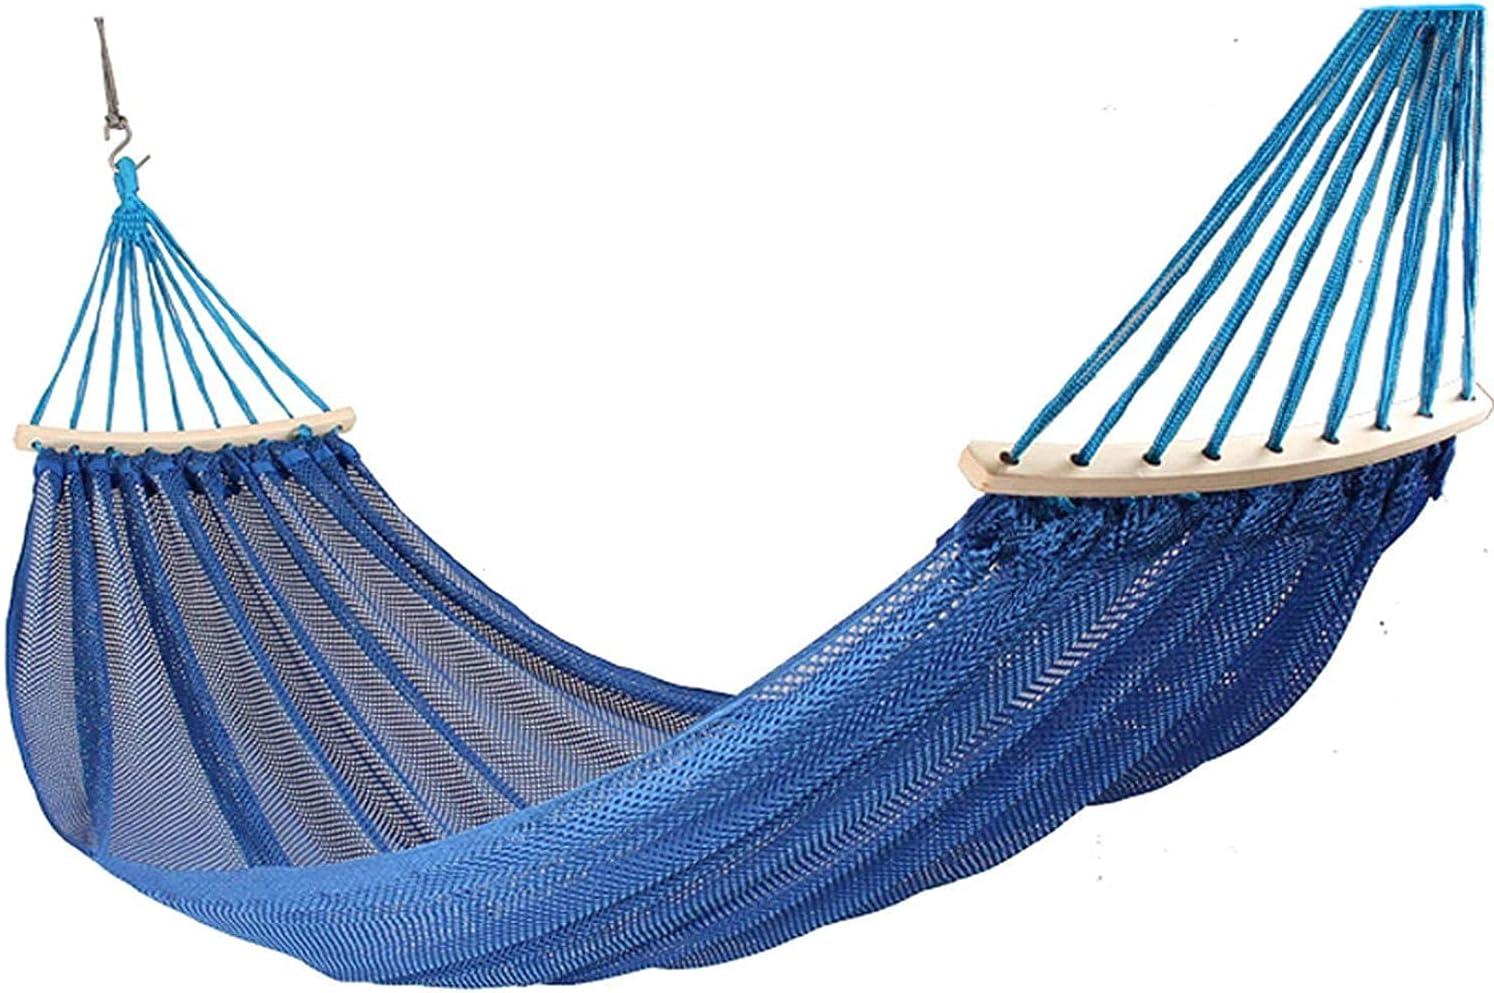 RVTYR Hanging Camping Hammock Mesh Anti-Rollov Breathable Trust Casual Max 42% OFF